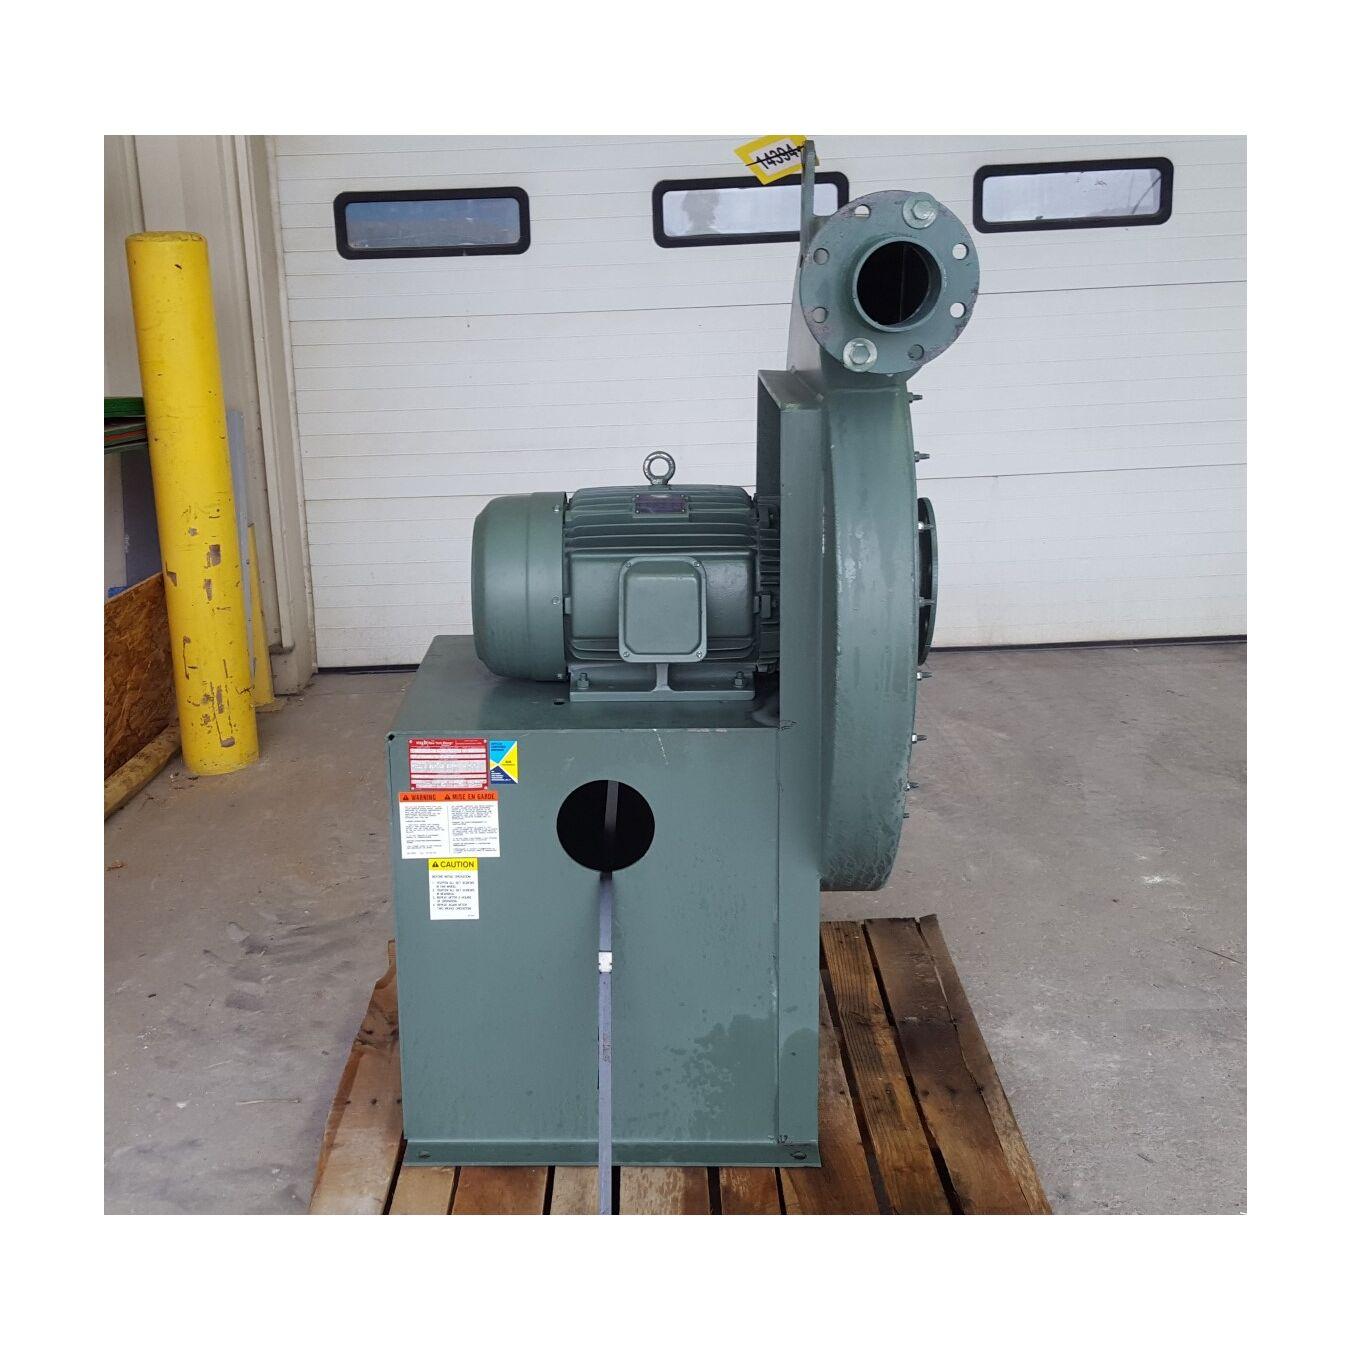 61 SP Unused 20 HP New York Pressure Blower 290 Alum : Fans & B  #AE8D1D